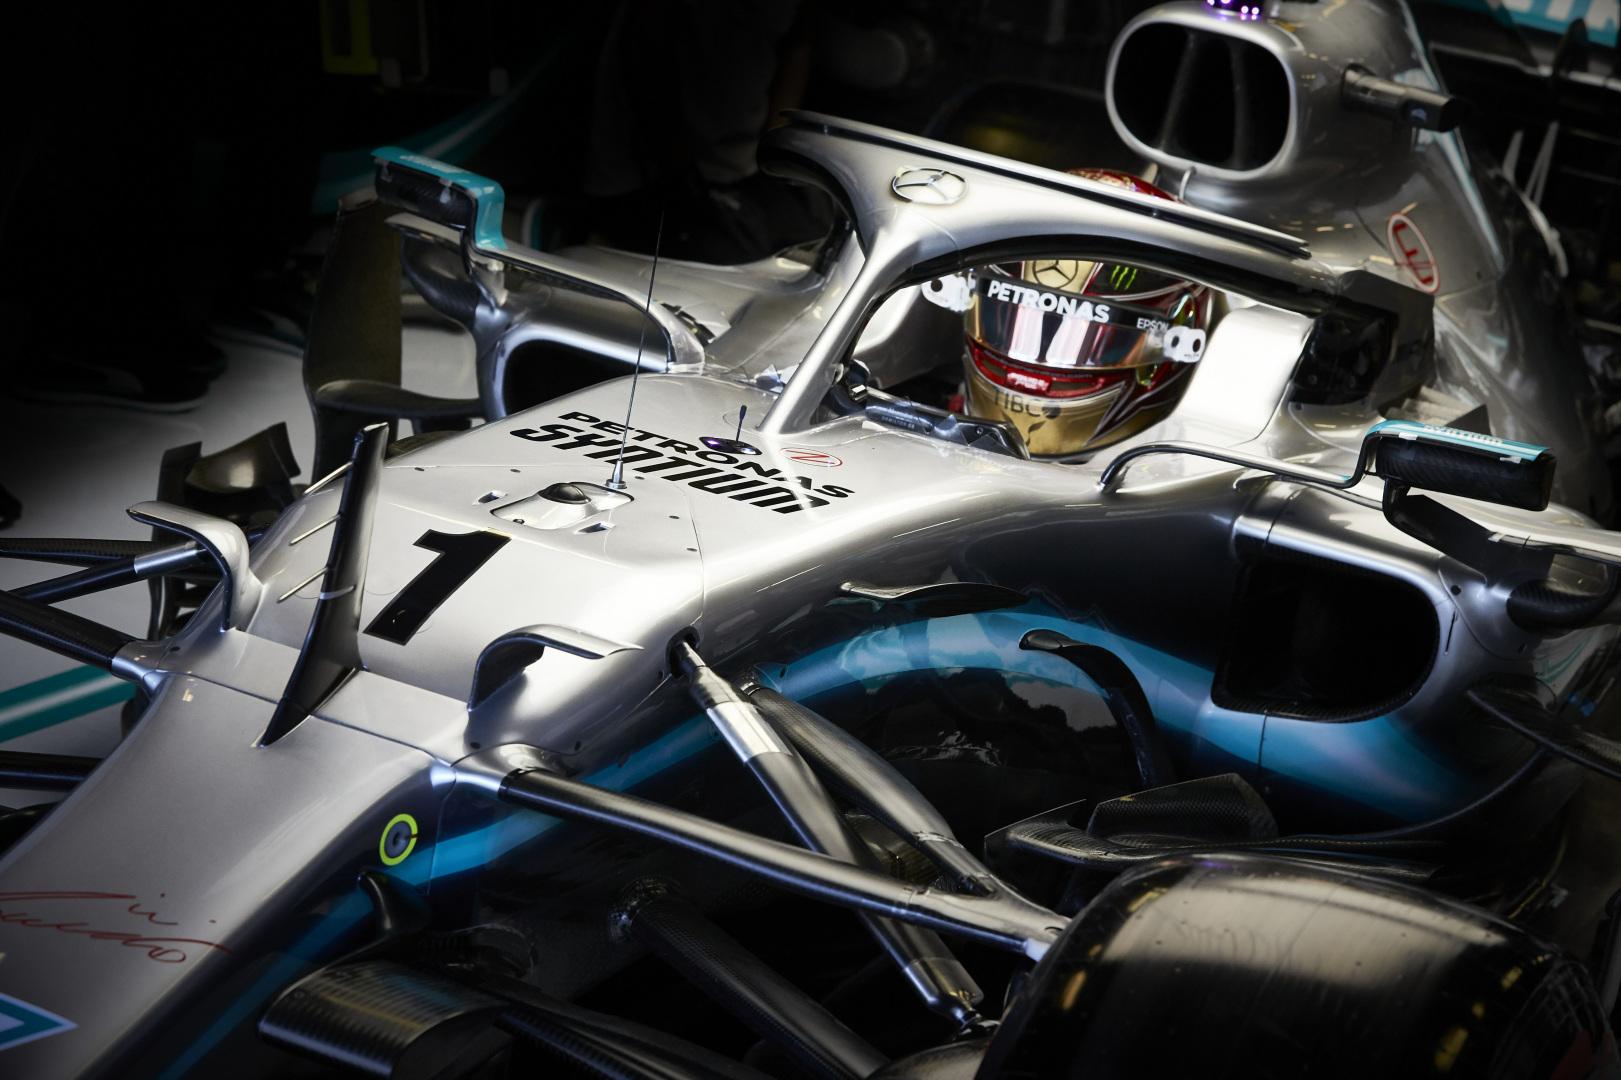 2019 Abu Dhabi Grand Prix, Friday - Steve Etherington